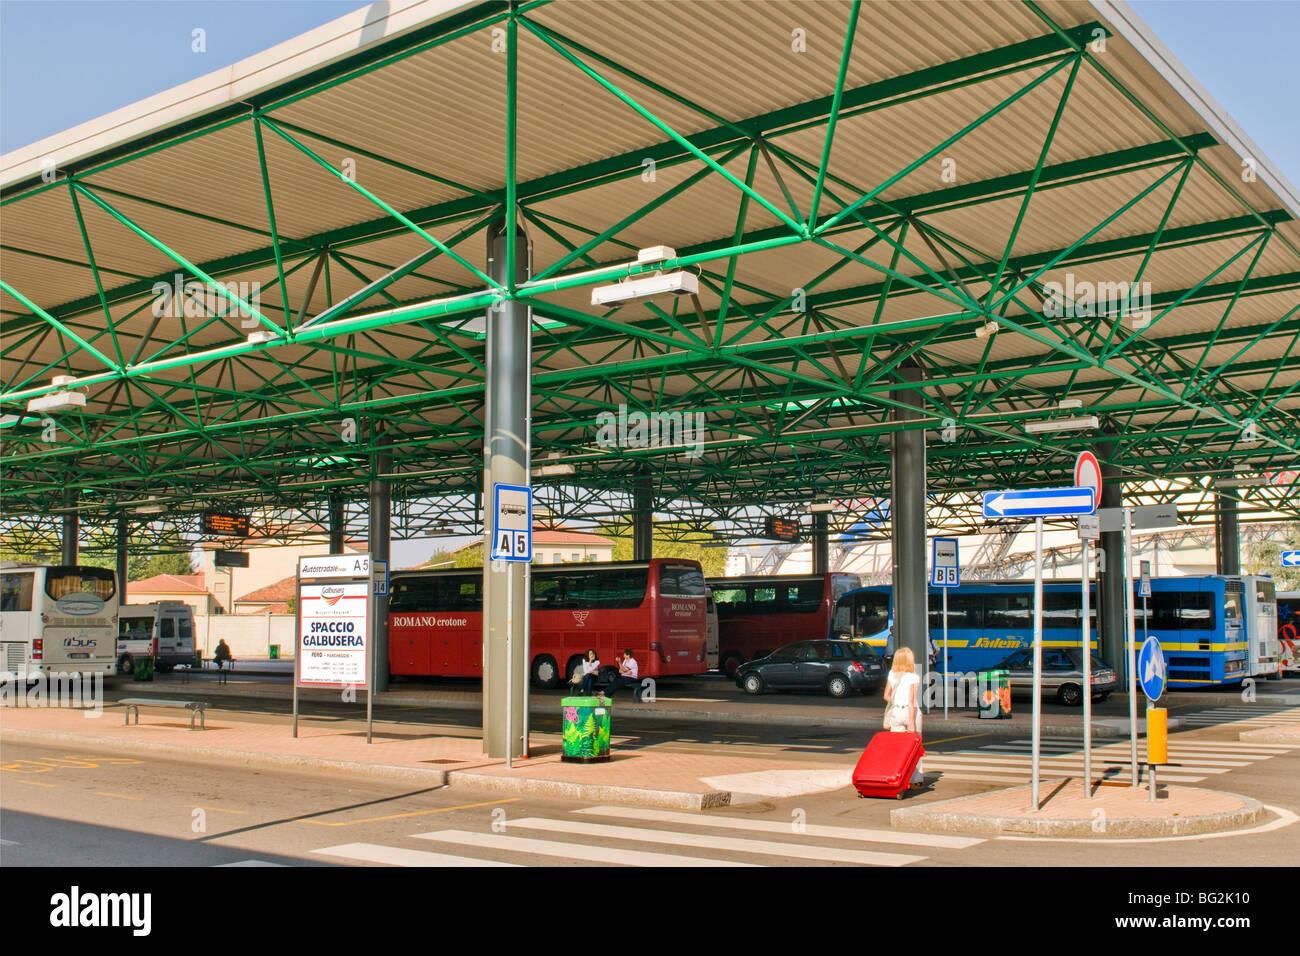 Milano Lampugnano - Malpensa Aeroporto Mxp Terminal 2